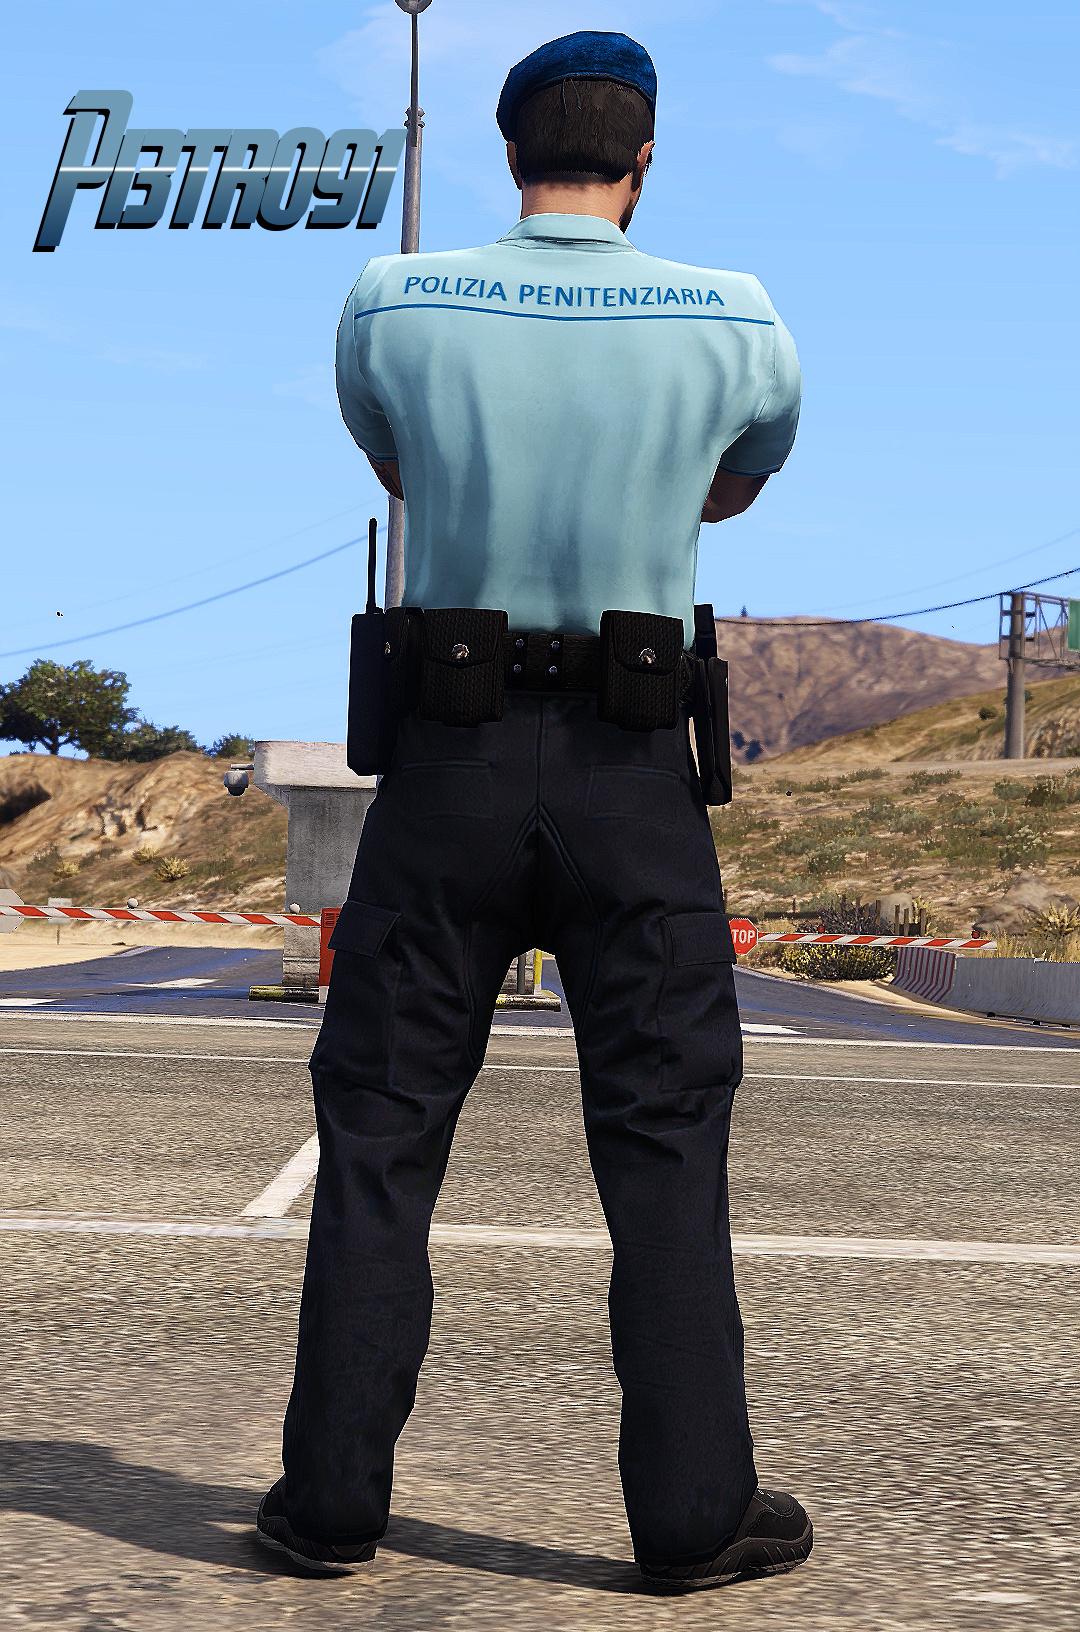 Divisa Polizia Penitenziaria Freemode Gta5 Mods Com